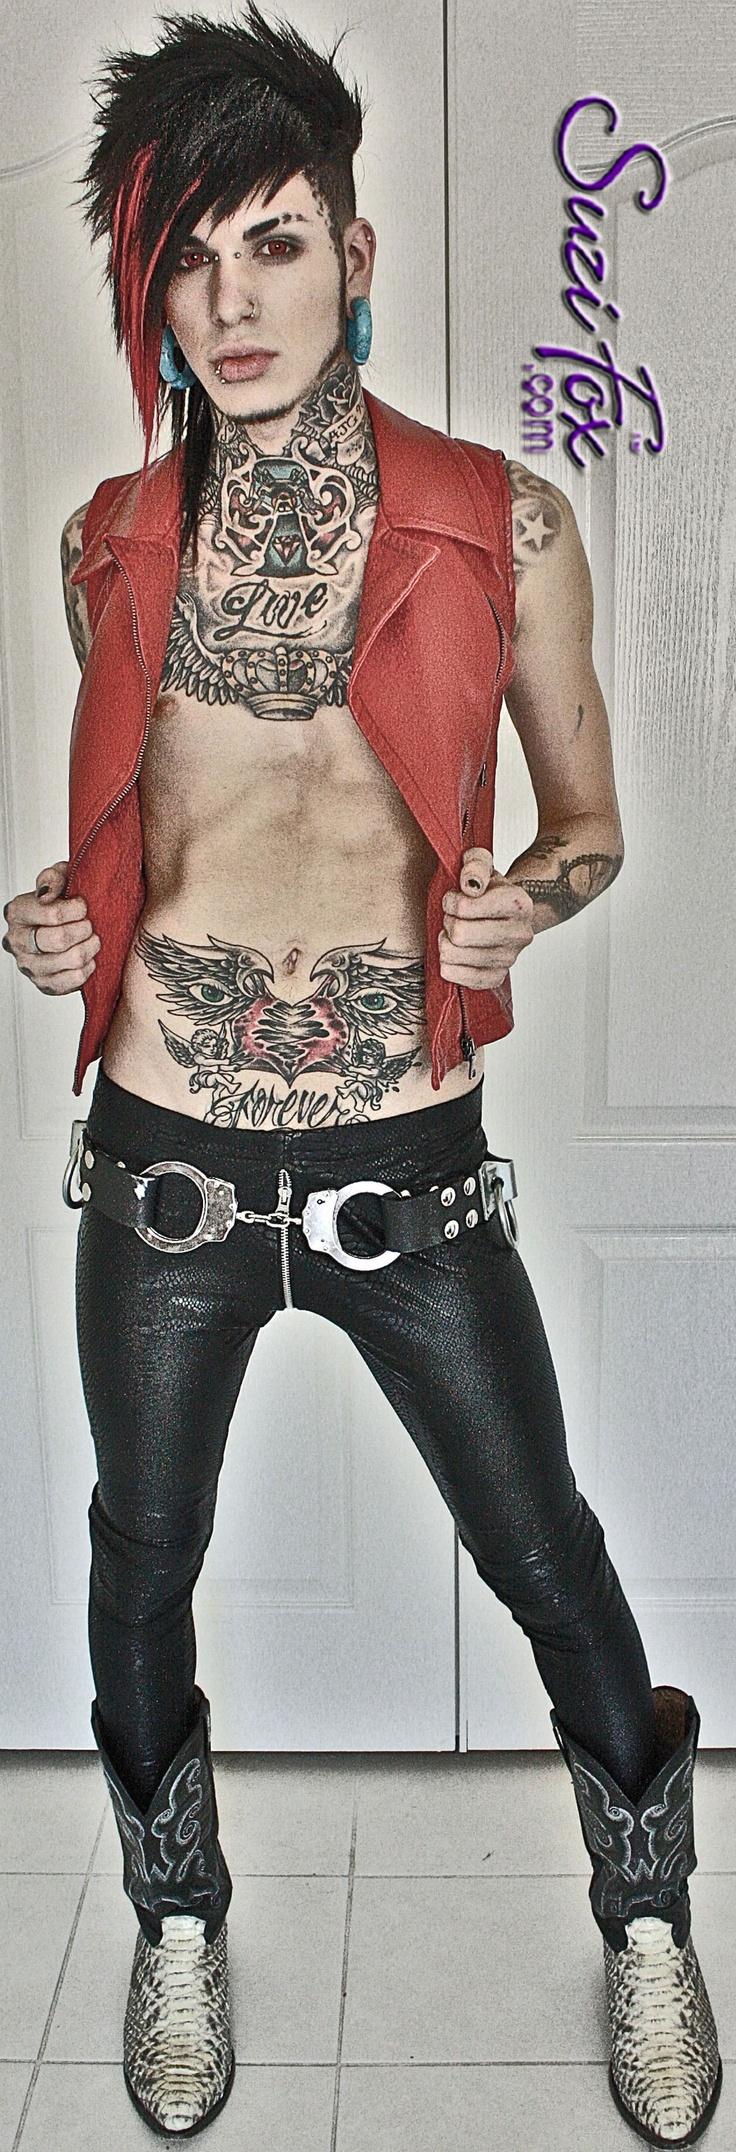 Jayy Von Monroe of the band Blood on the Dance Floor  (Suzi Fox black snake pants!)  https://www.facebook.com/JayyVonHatesYou https://www.facebook.com/bloodonthedancefloor  https://www.facebook.com/SuziFoxFashion http://www.liquidvinylclothing.com